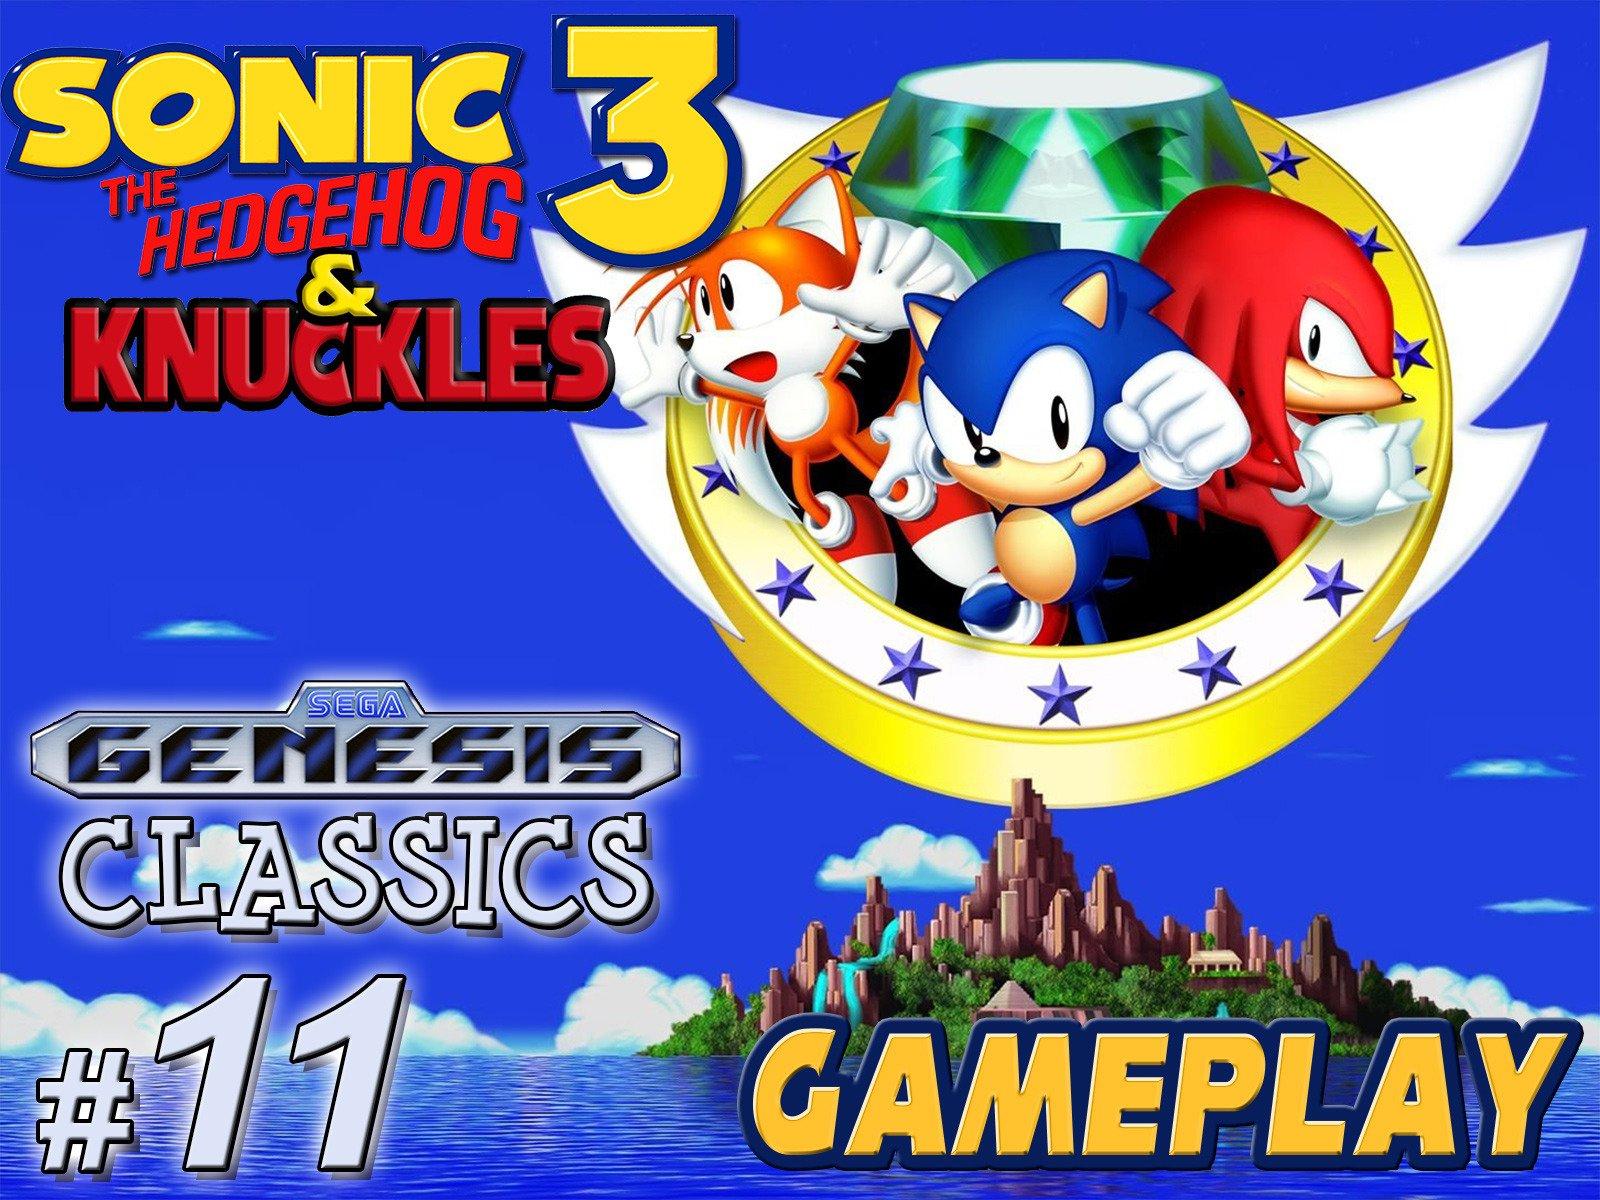 Clip: Sonic the Hedgehog 3 & Knuckles Gameplay (Genesis Classics 11) - Season 1